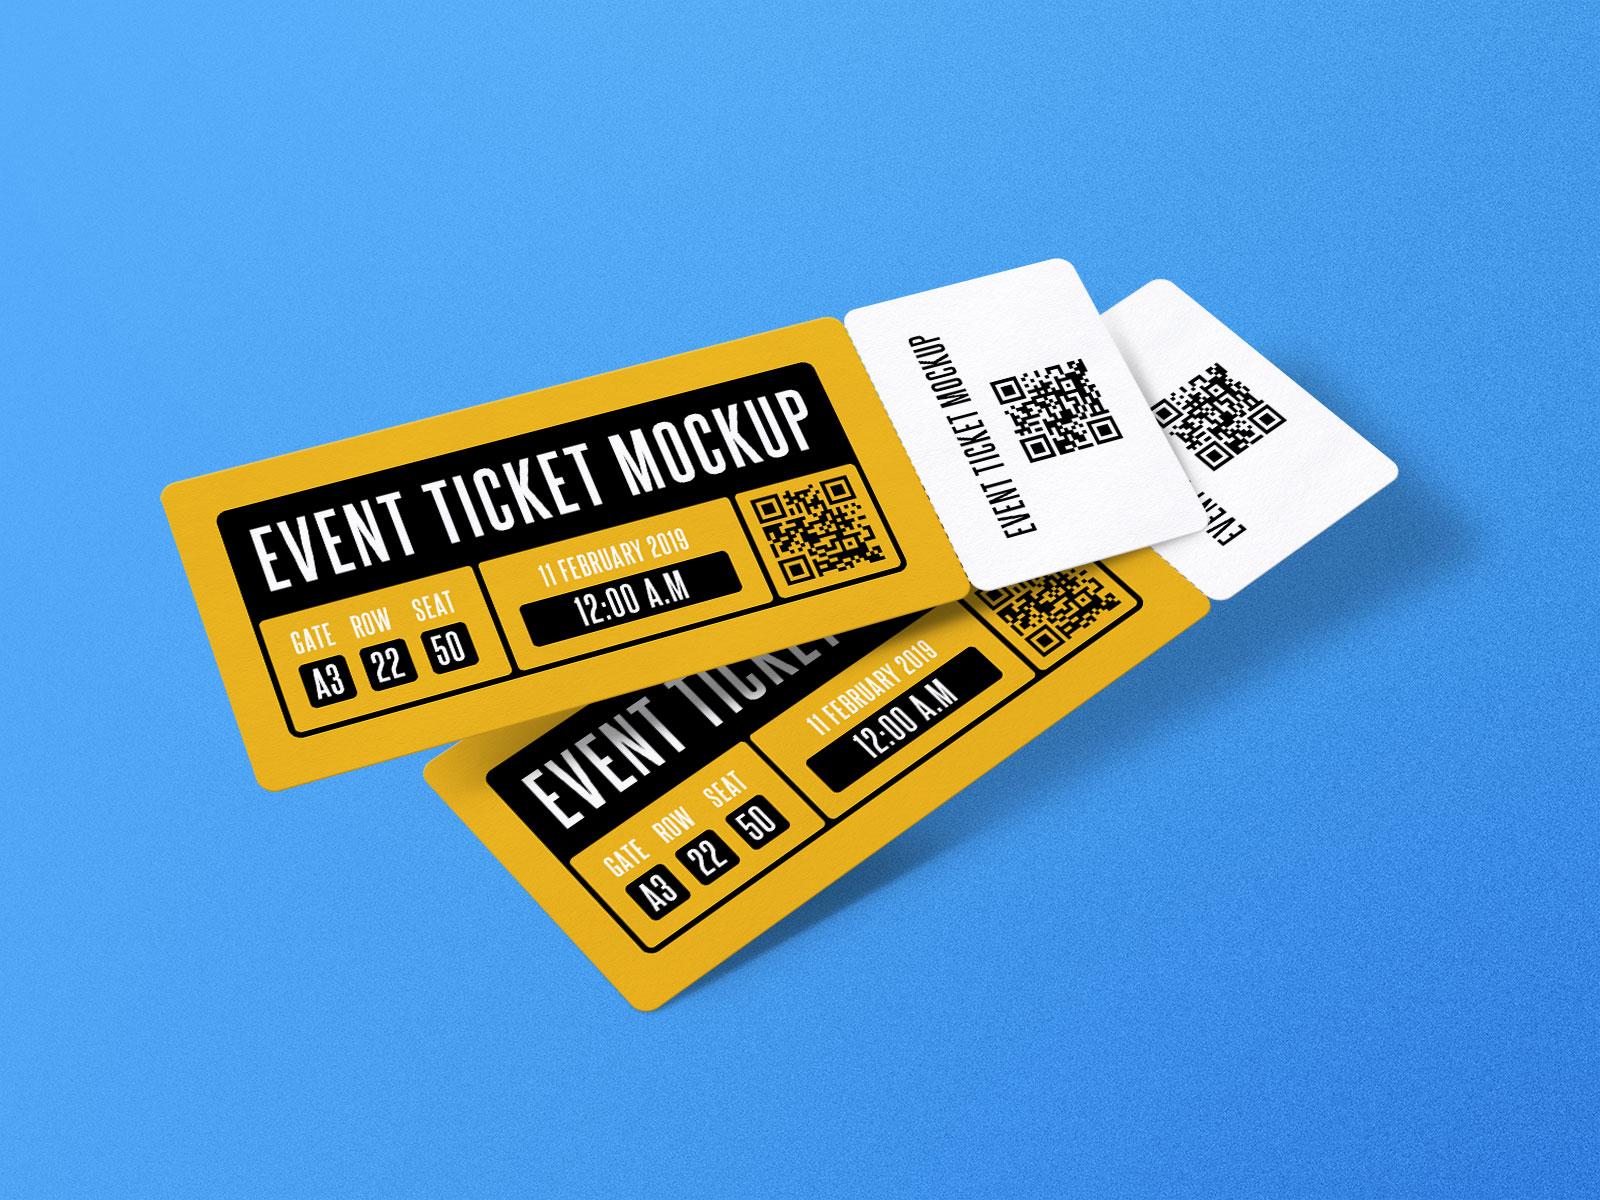 free paper concert    event ticket mockup psd set